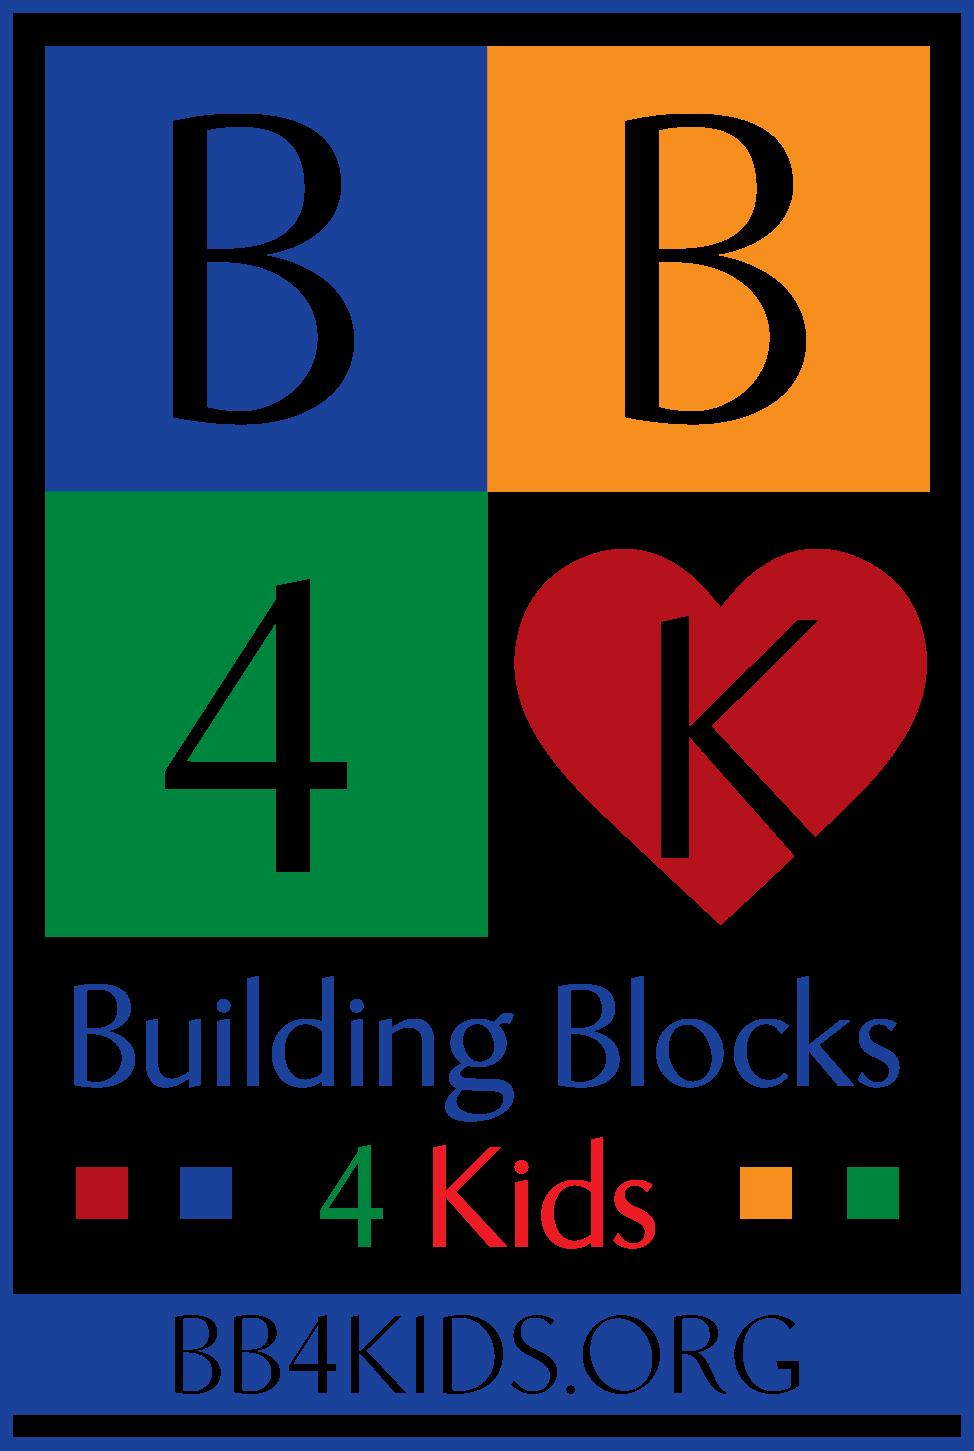 BB4 Kids Logo